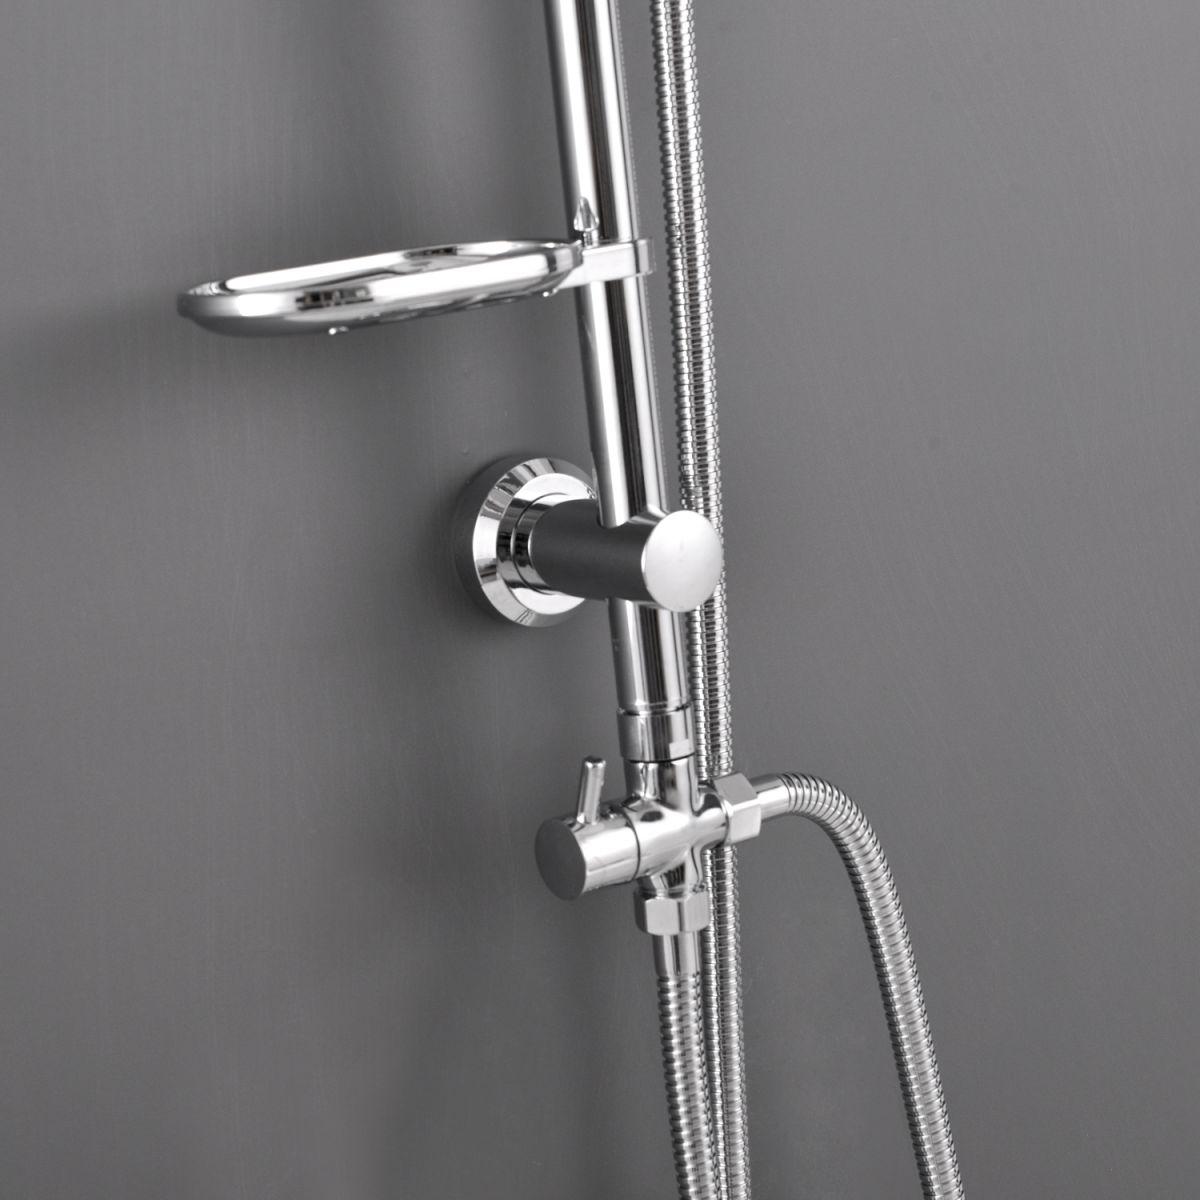 SS 14 5 Colonna doccia